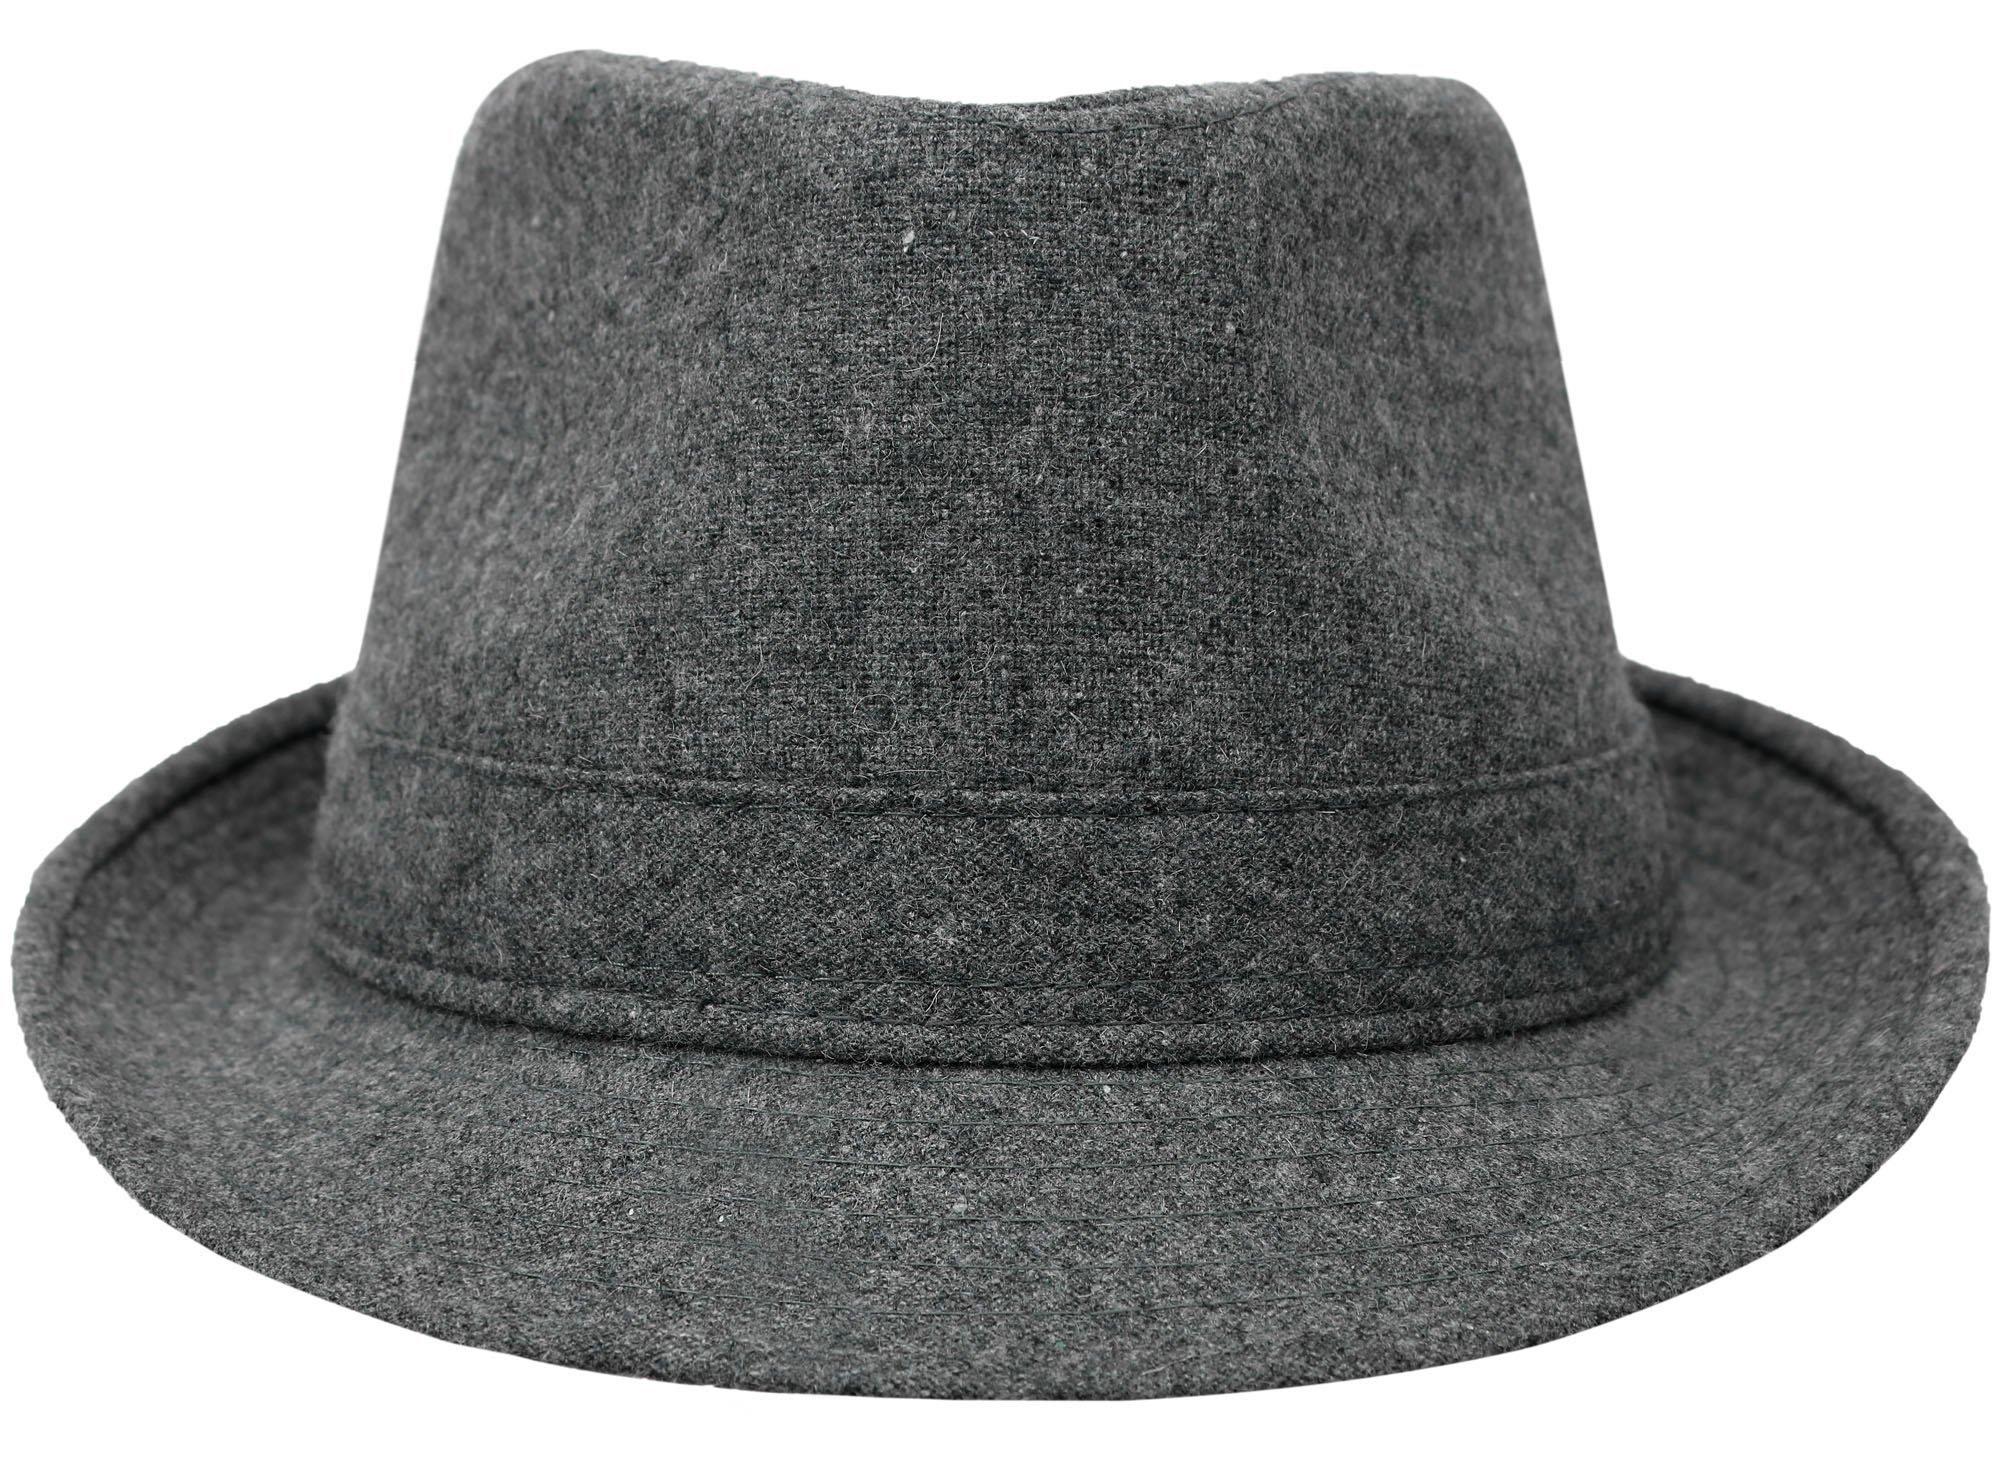 KEA KEA Vintage Unisex Fedora Hat Classic Timeless Lightweight Fedora Hat Grey by KEA KEA (Image #3)